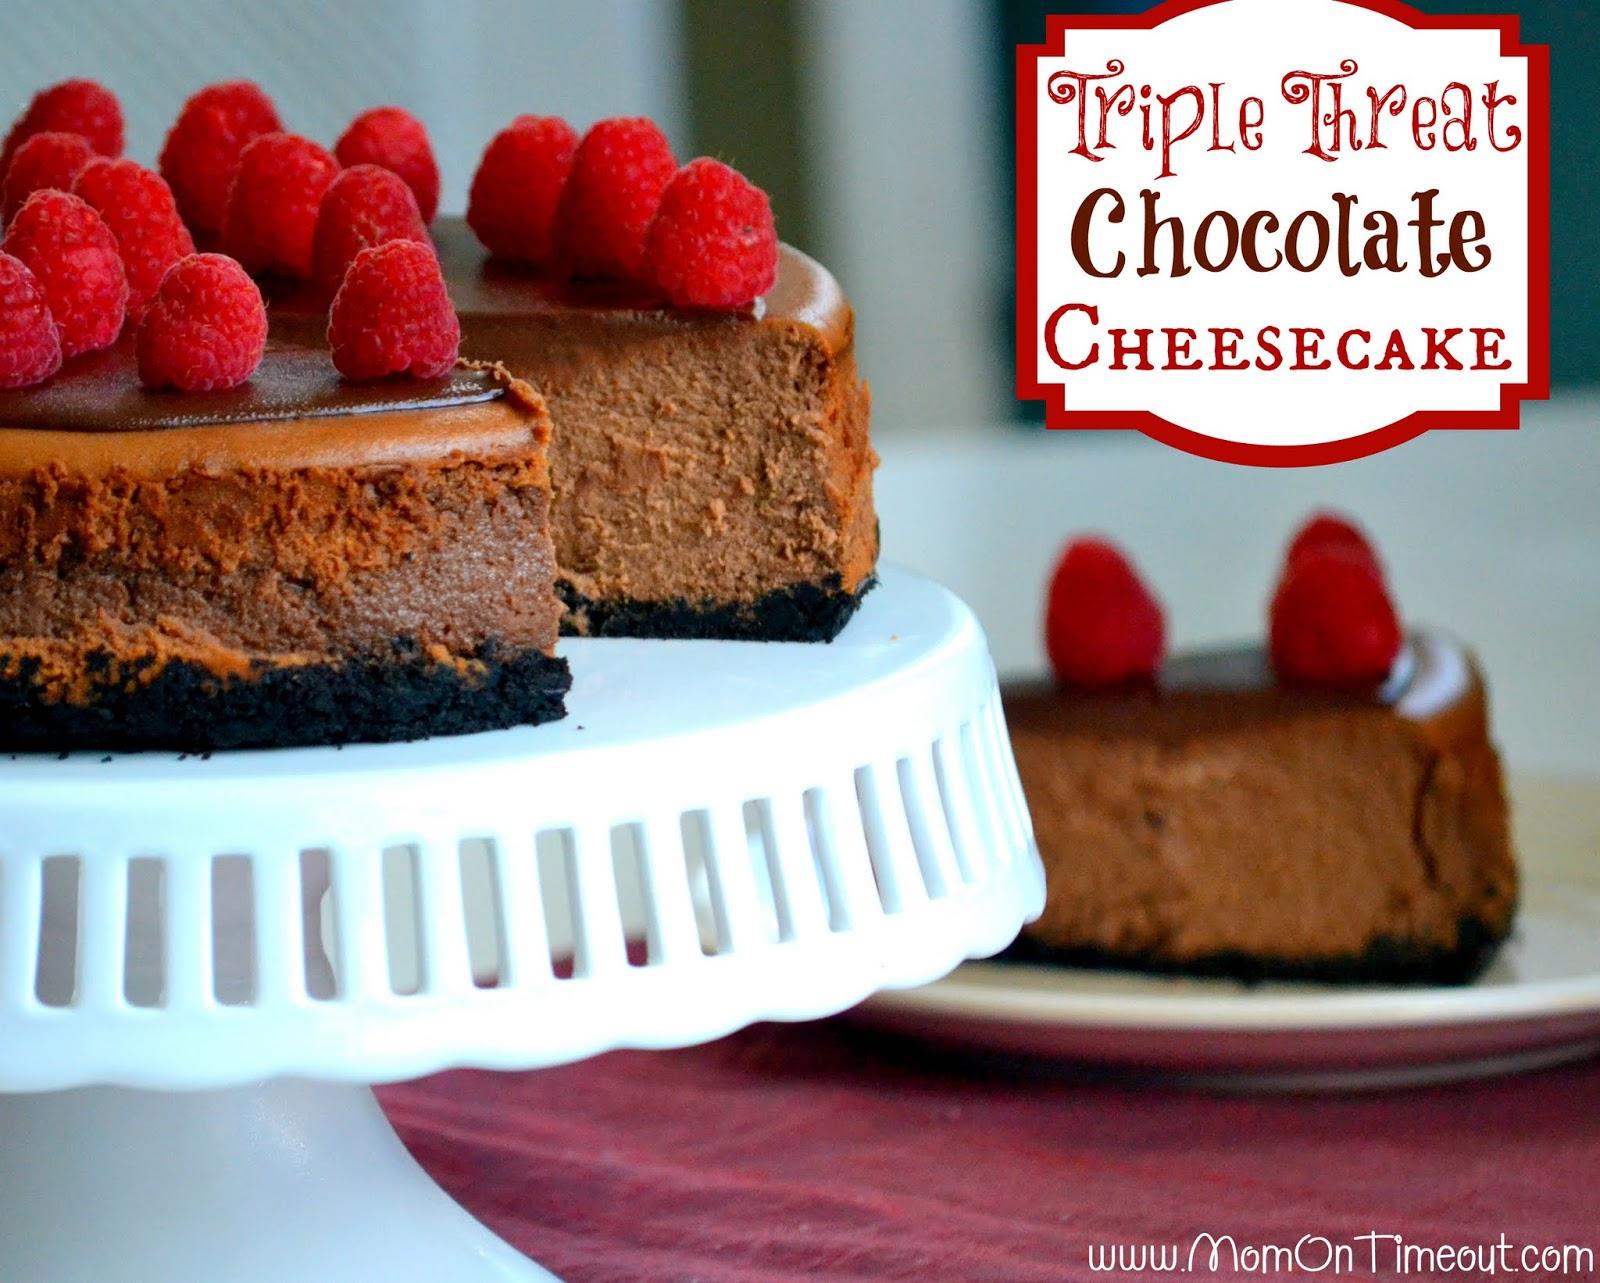 Triple Threat Chocolate Cheesecake - Mom On Timeout